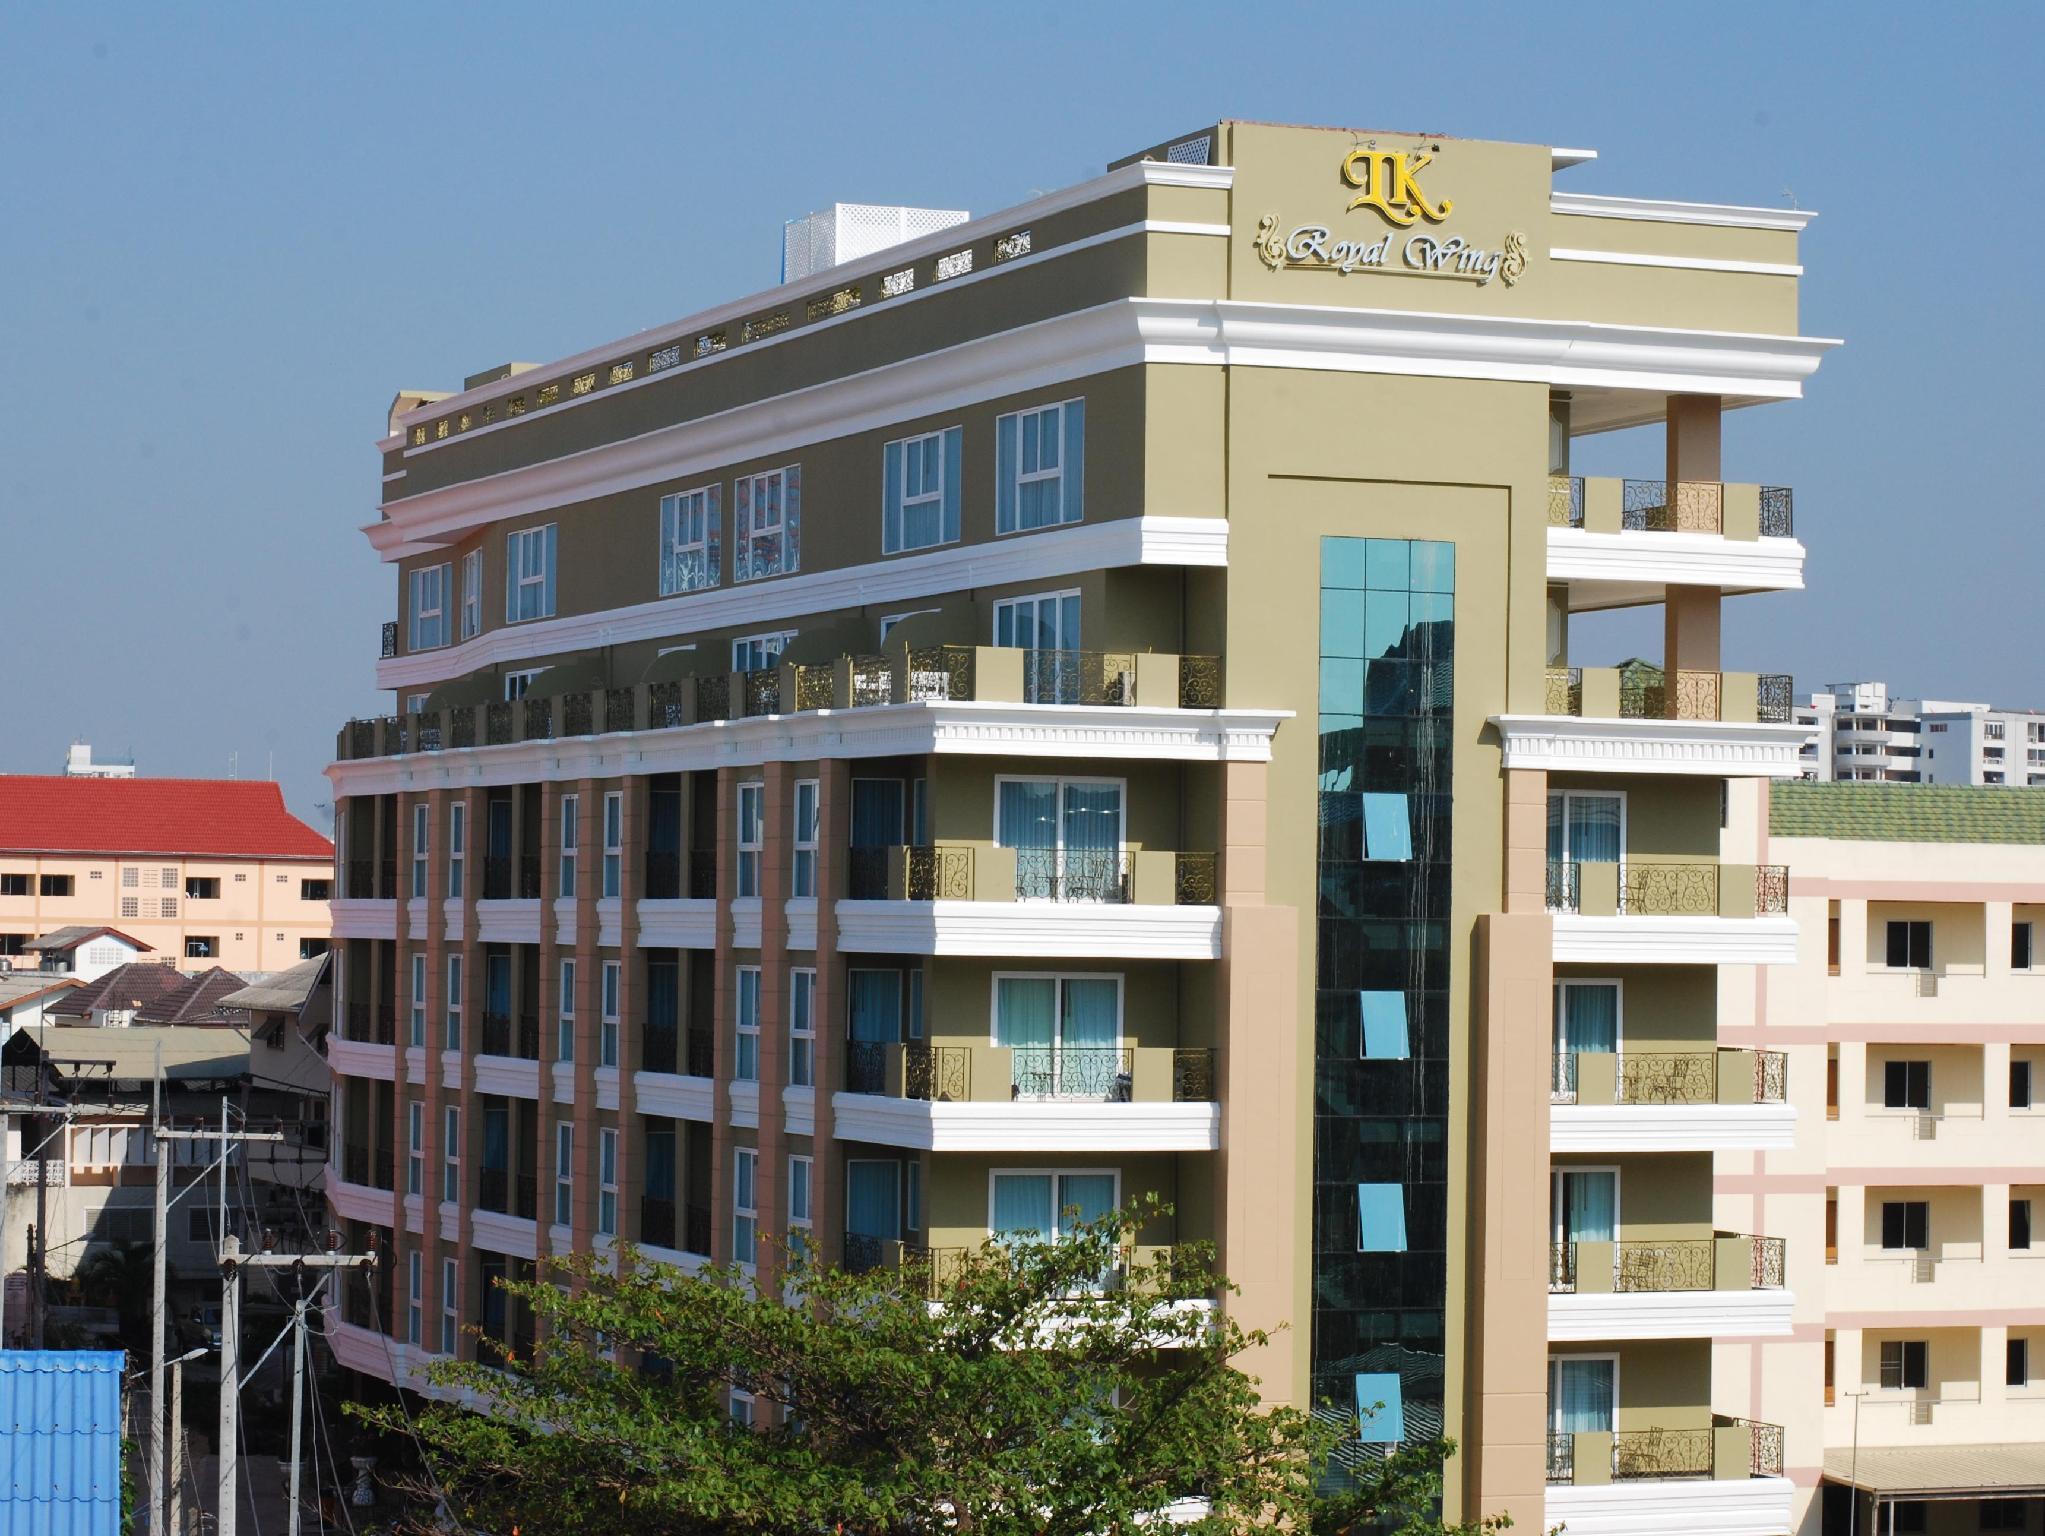 LK Royal Wing Hotel แอลเค รอยัล วิง